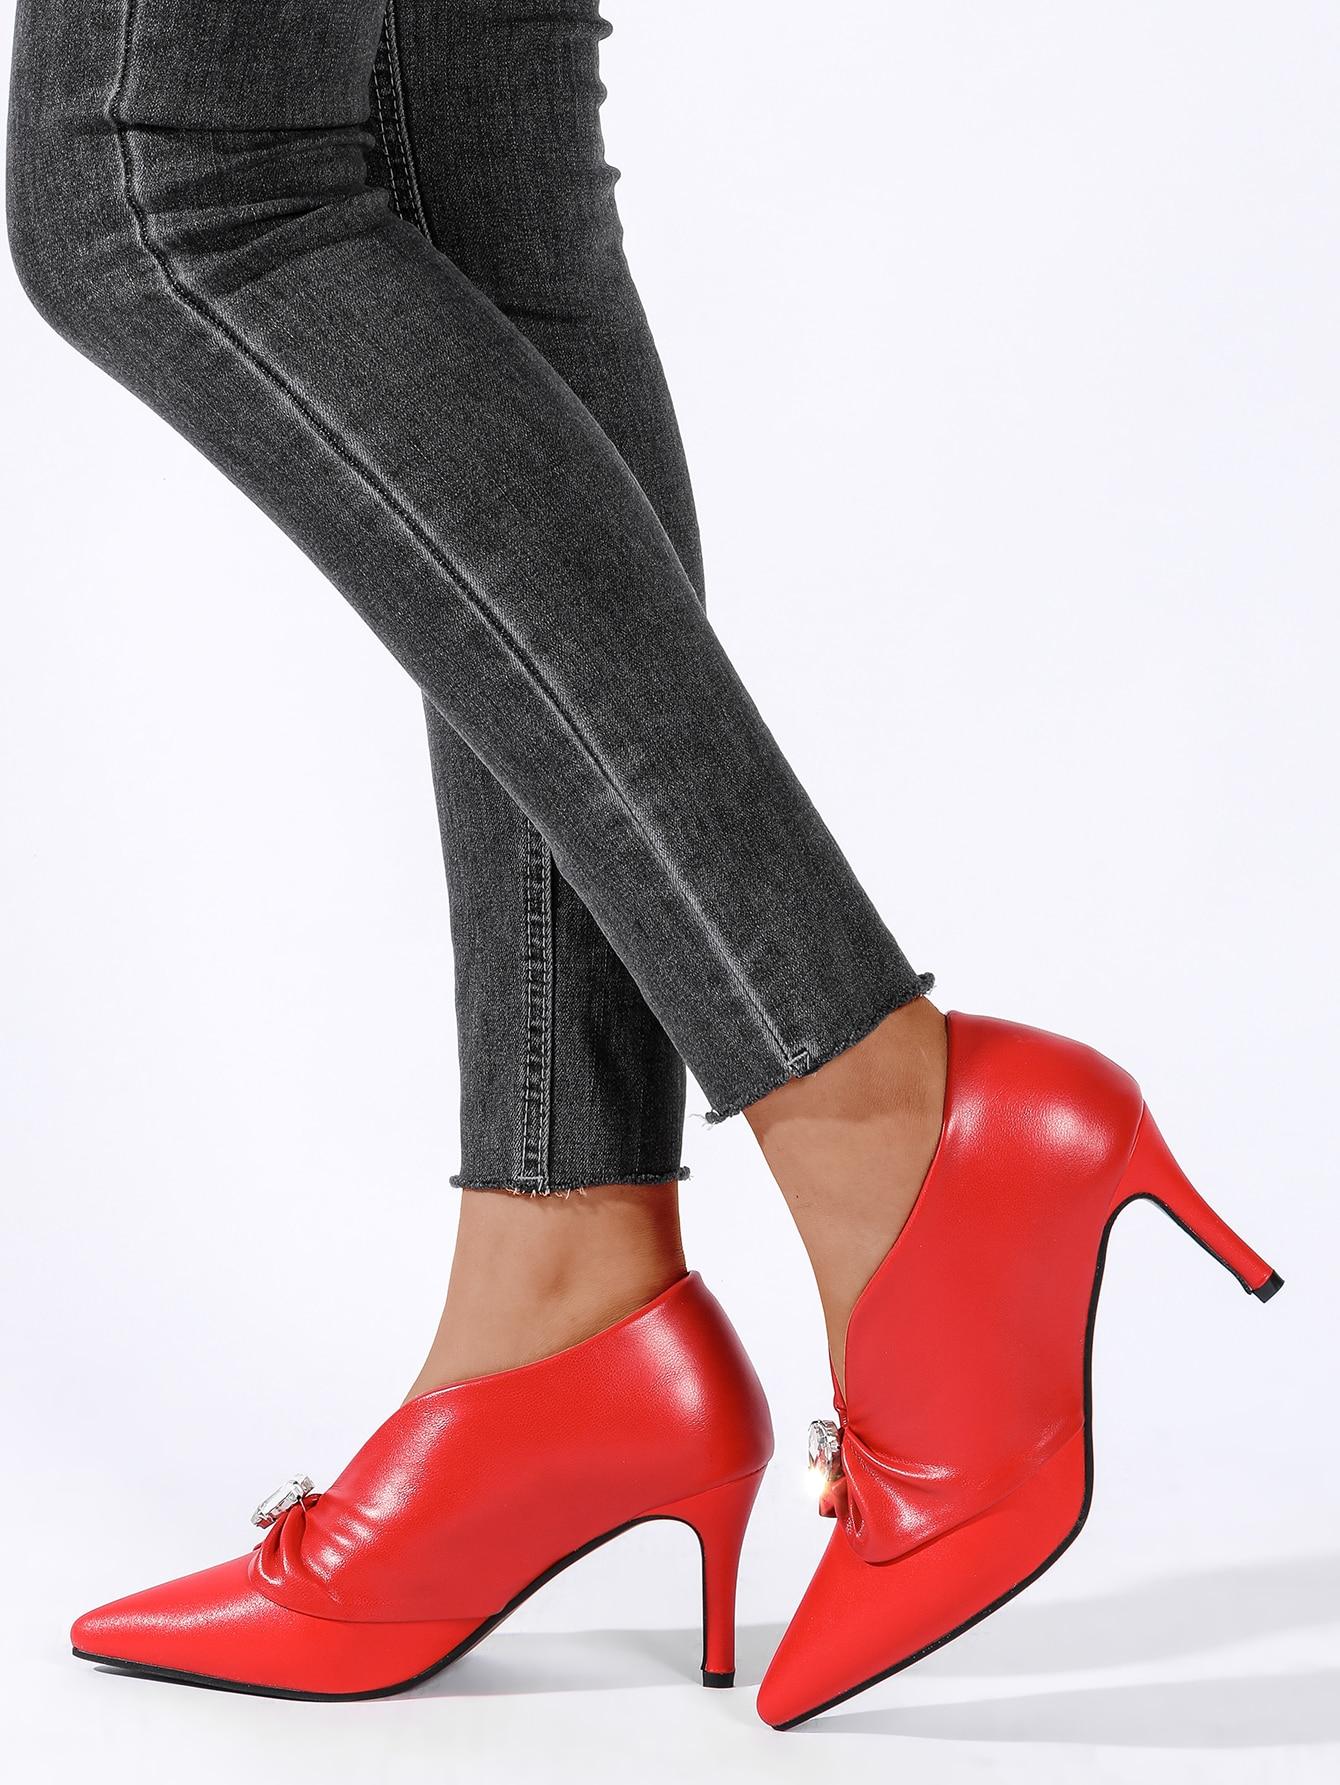 Point Toe Gemstone Decor Stiletto Boots